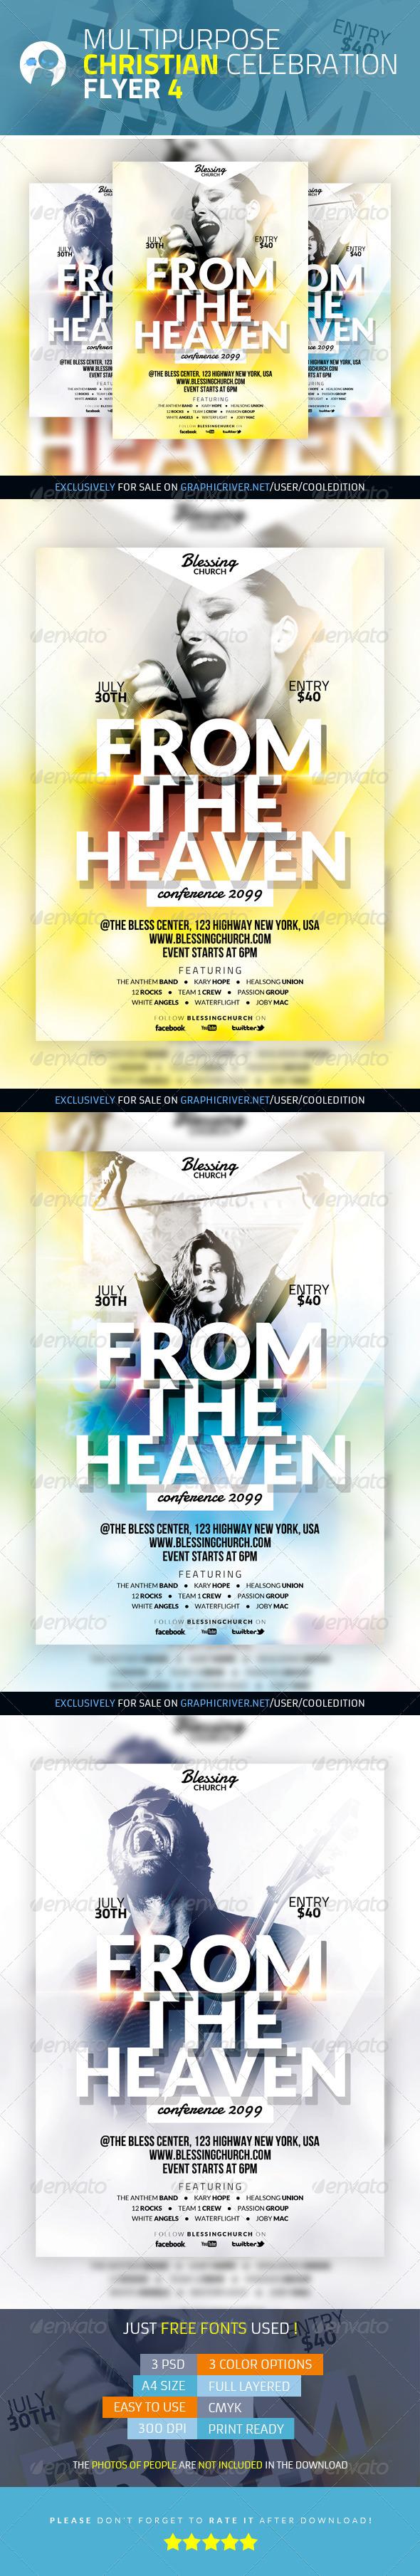 Multipurpose Christian Celebration Flyer 4 - Church Flyers